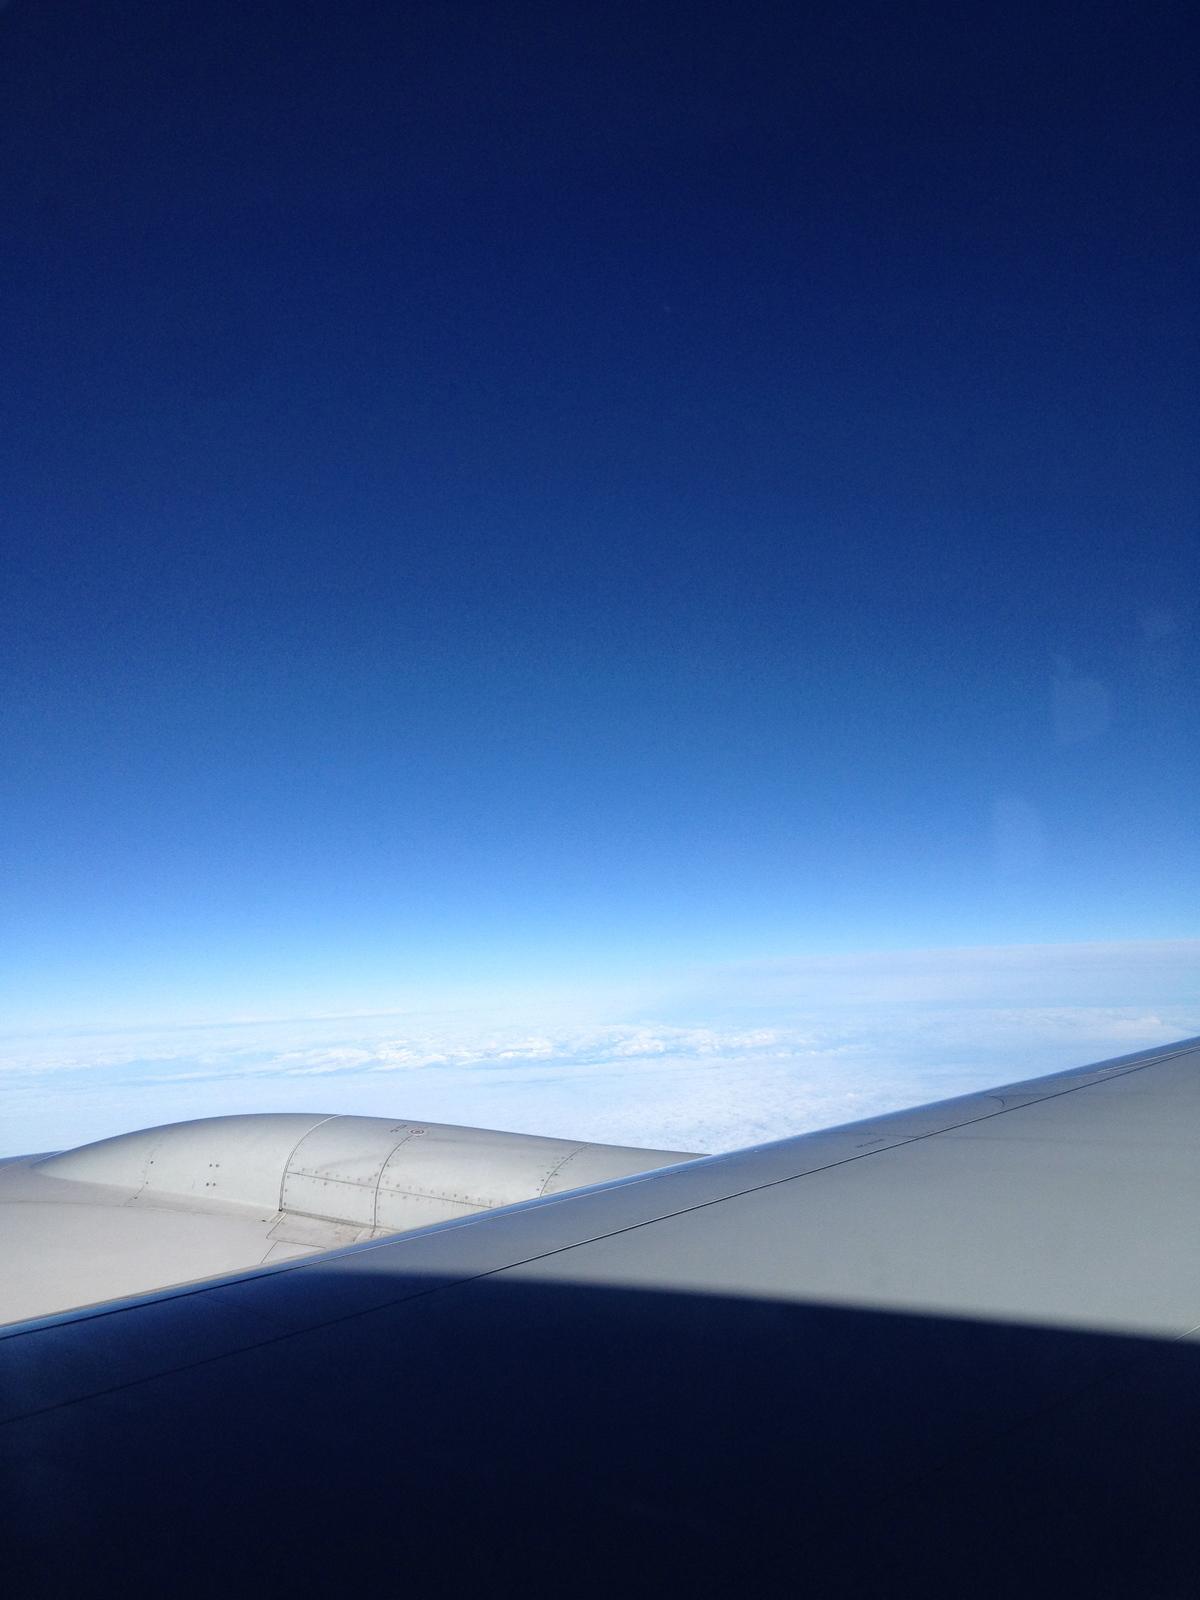 Greenland form Airplane Window